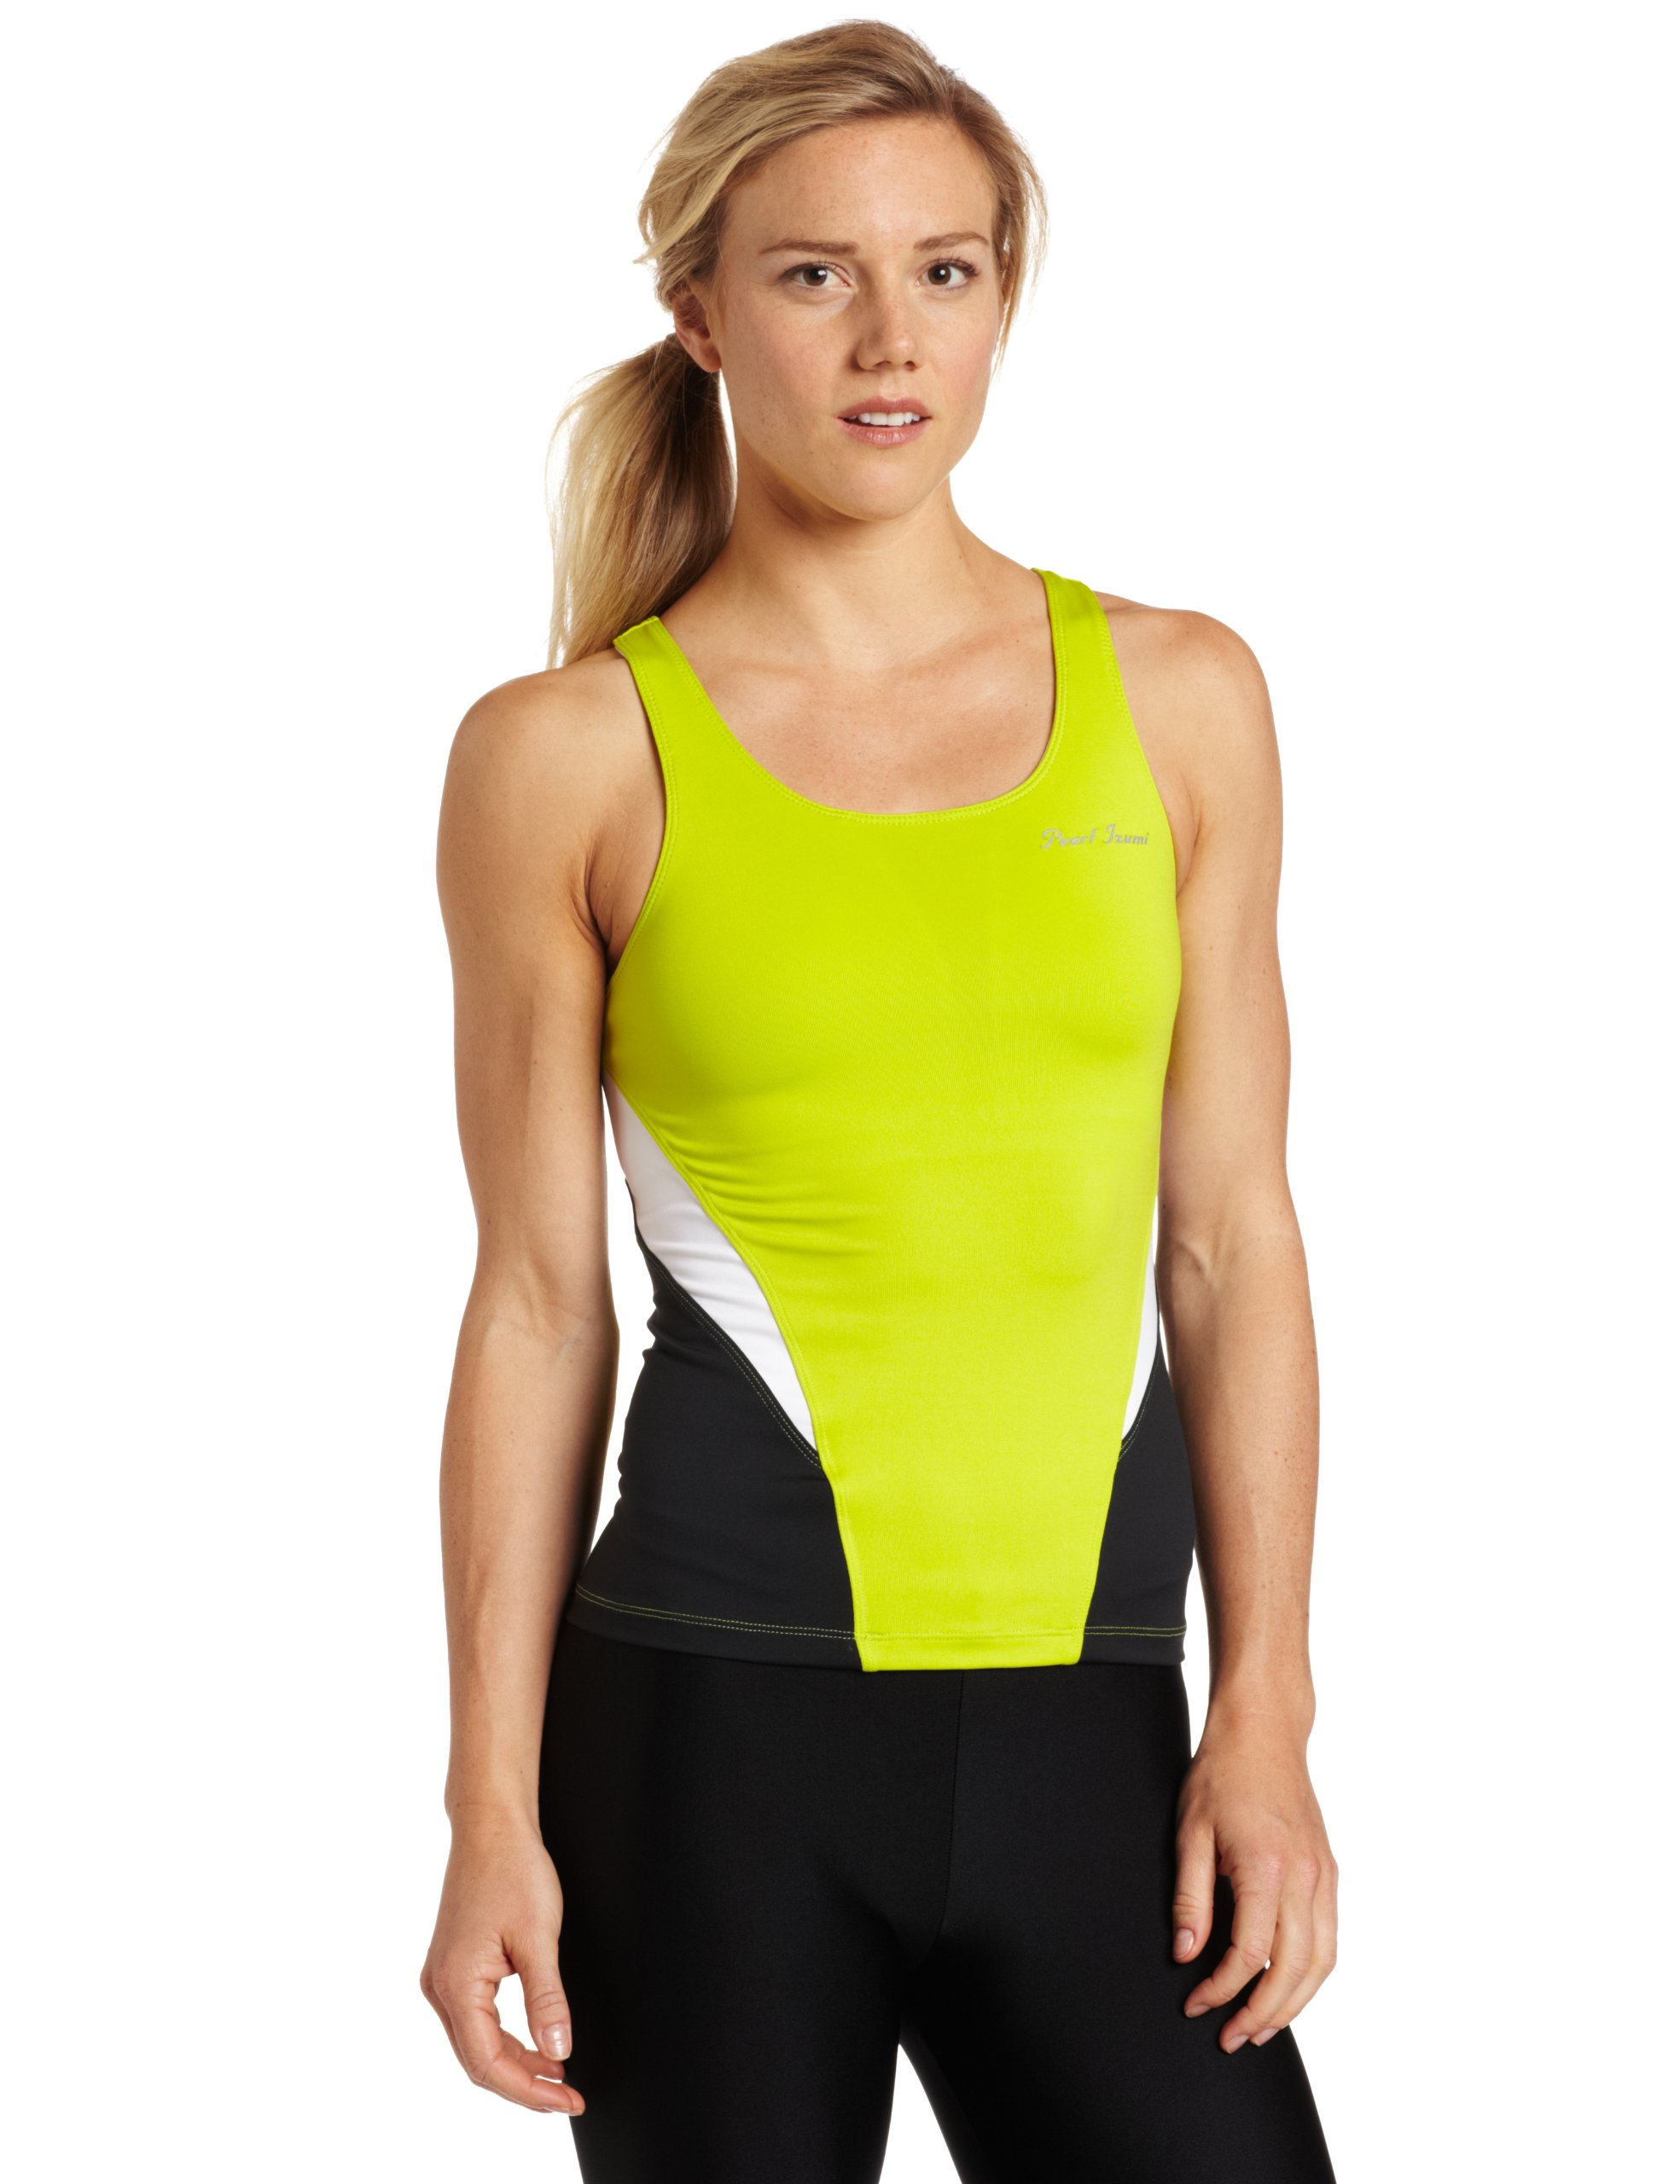 fa82845b991ed Amazon.com  Pearl Izumi Women s Infinity Sport Tank  Clothing